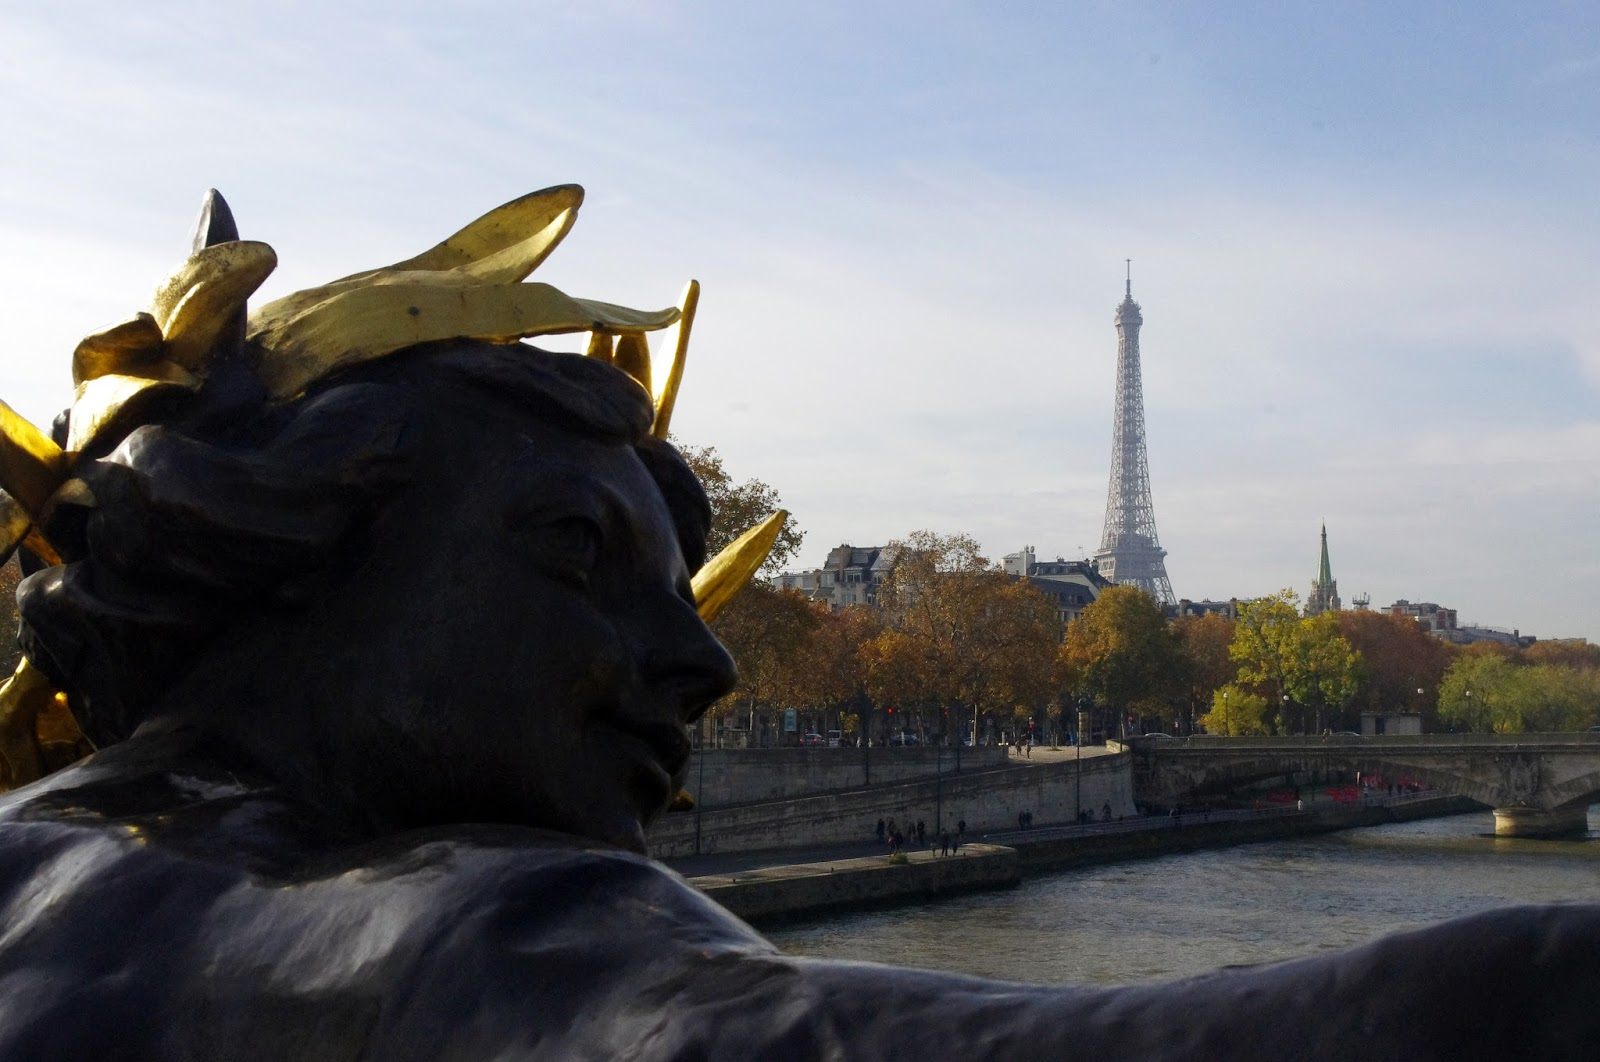 Eiffel Tower from Bridge in Paris